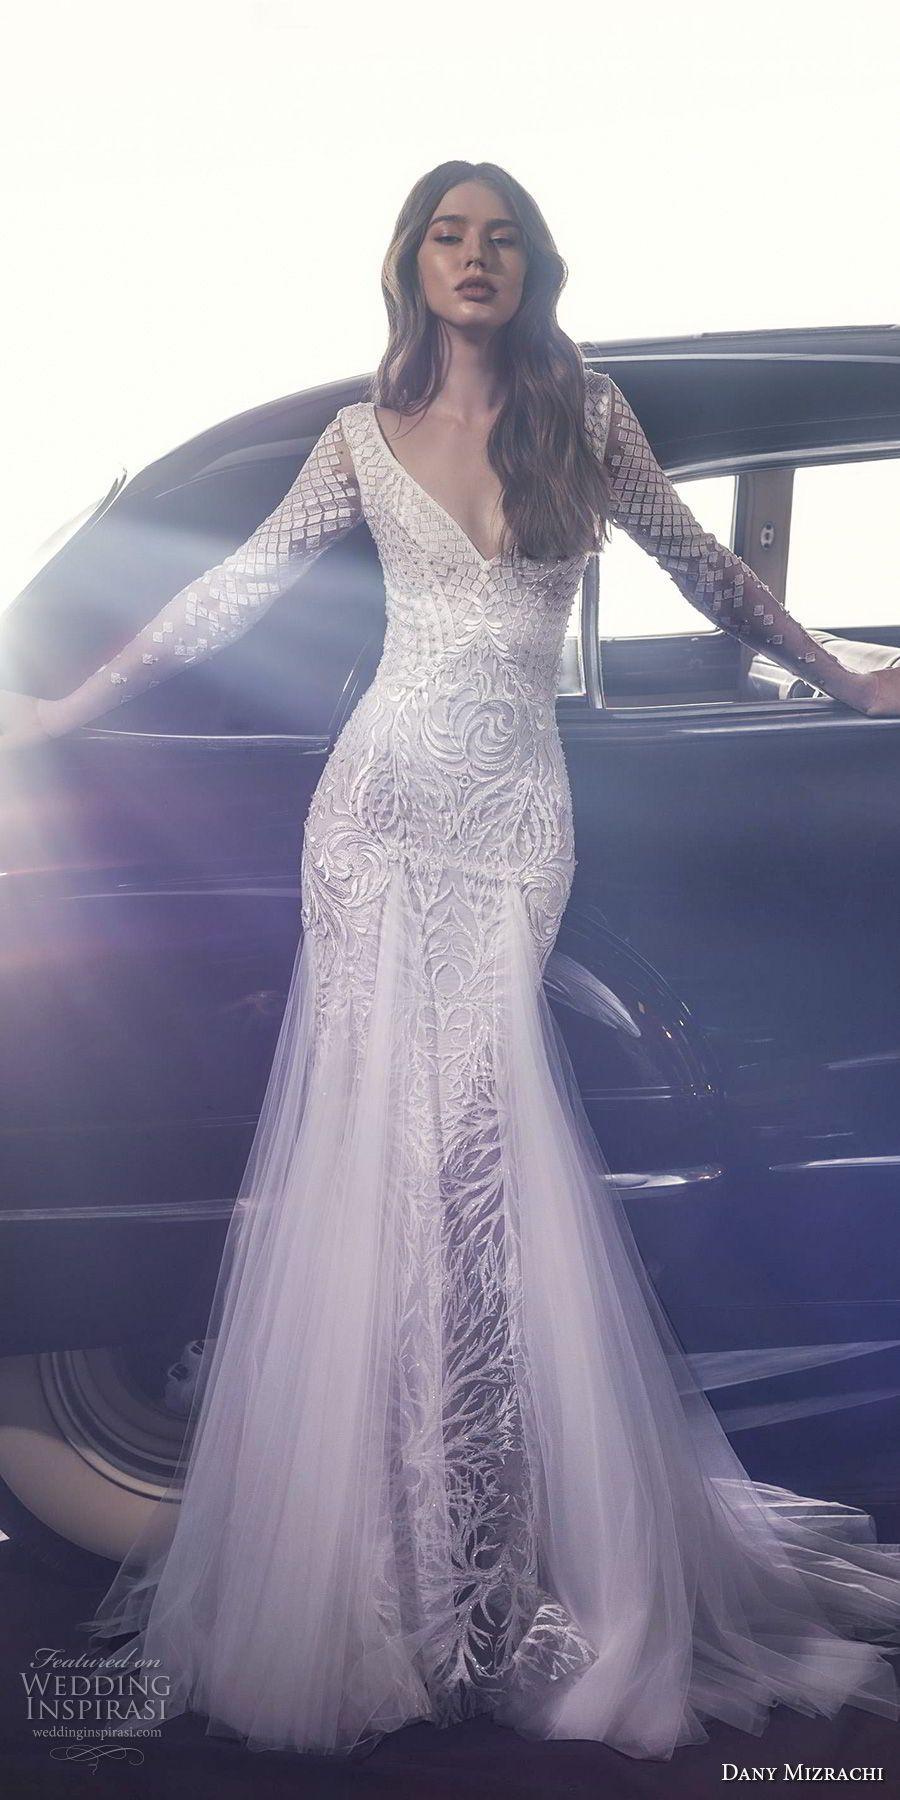 Dany mizrachi fall wedding dress chapel train wedding dress